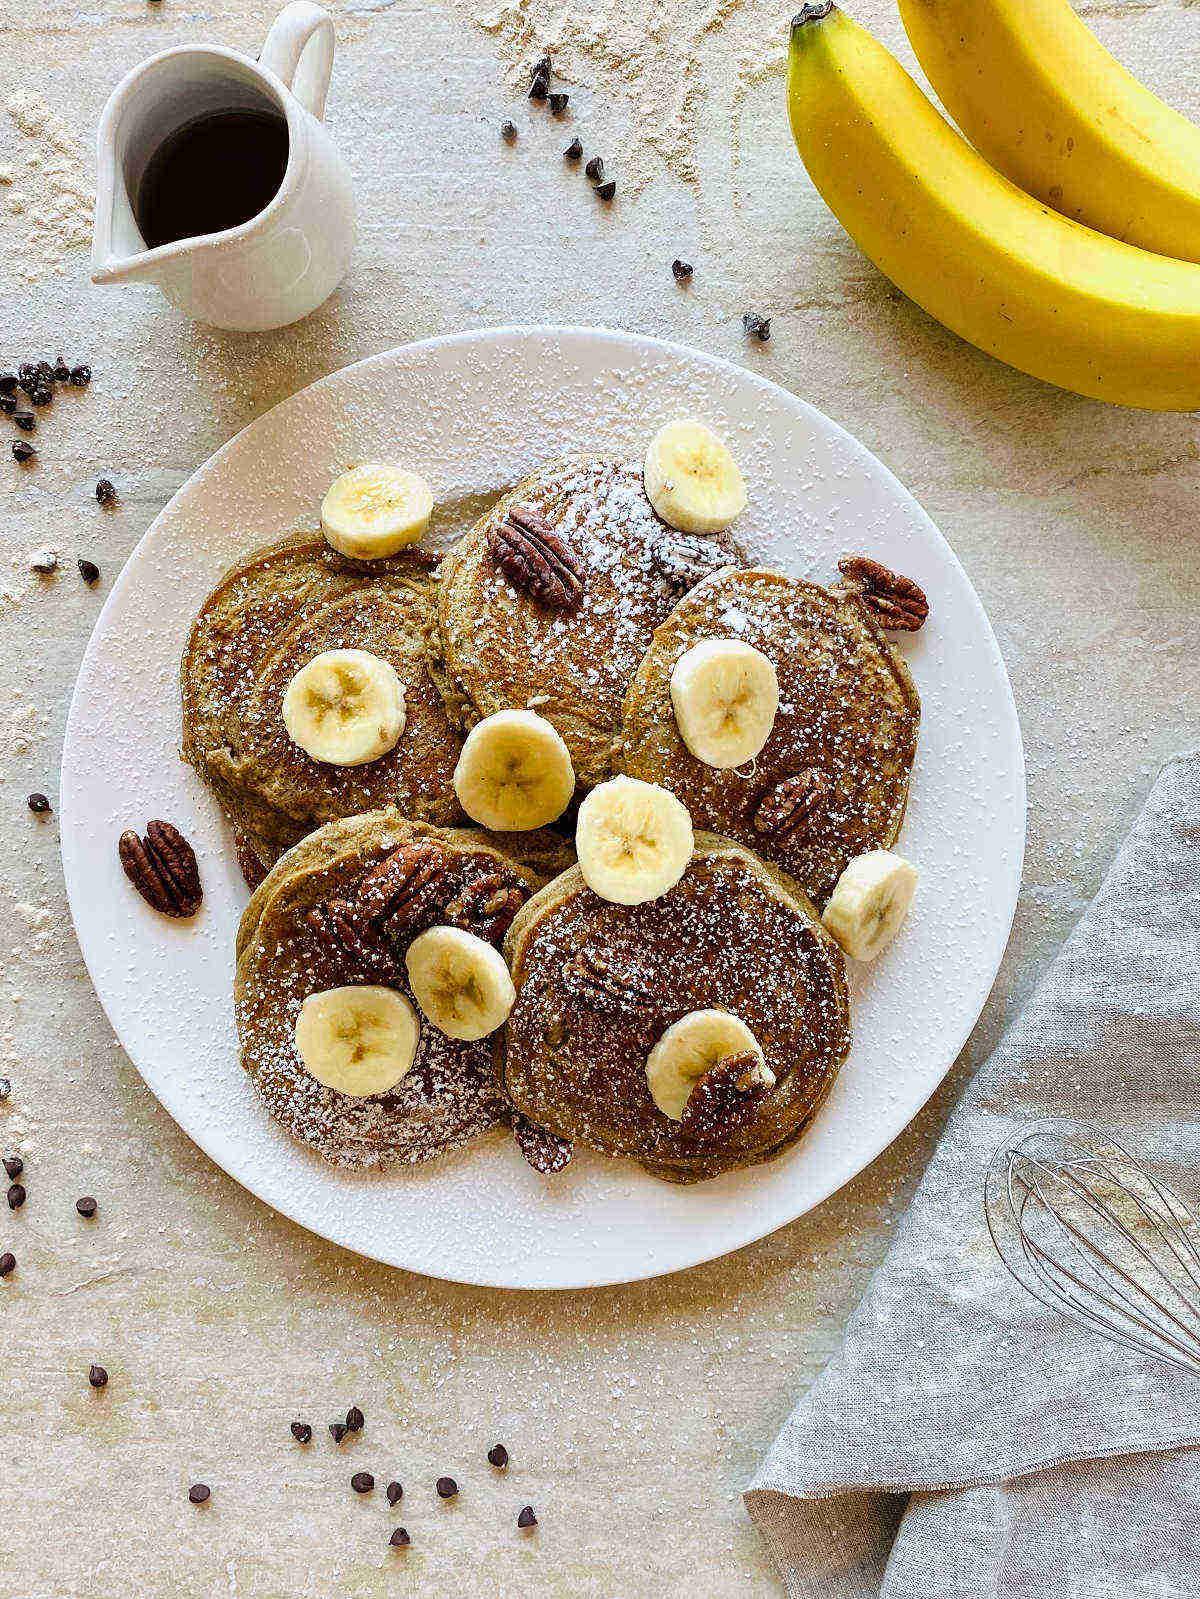 banana flour pancakes on plate